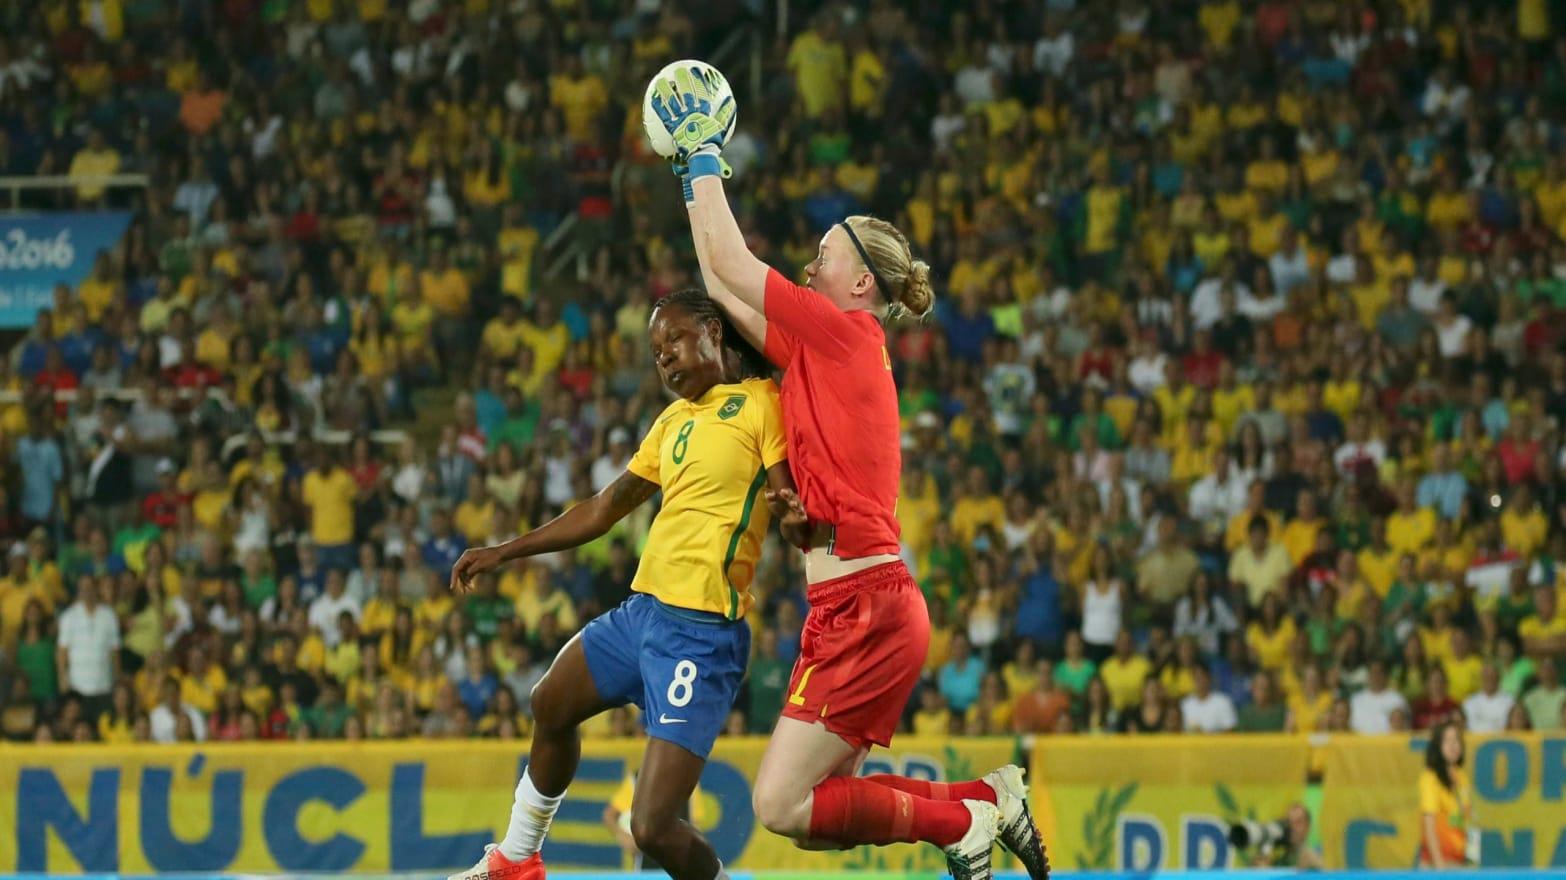 Rio Olympics 2016: How to Watch Brazil's Men's Soccer Team